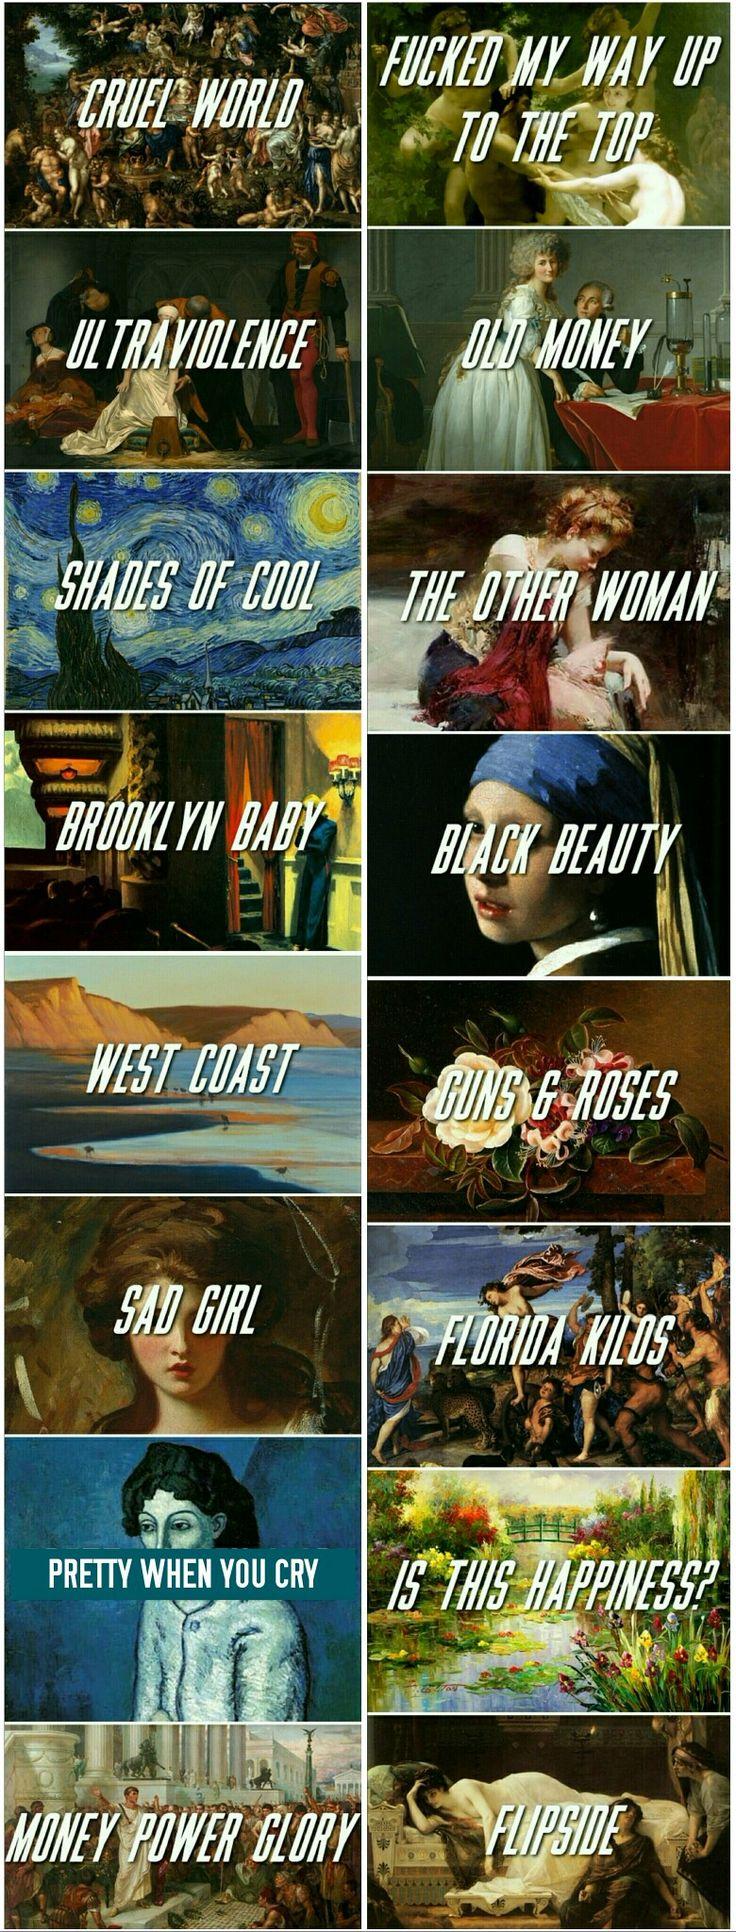 Lana Del Rey's Ultraviolence album + paintings #LDR #art #songs